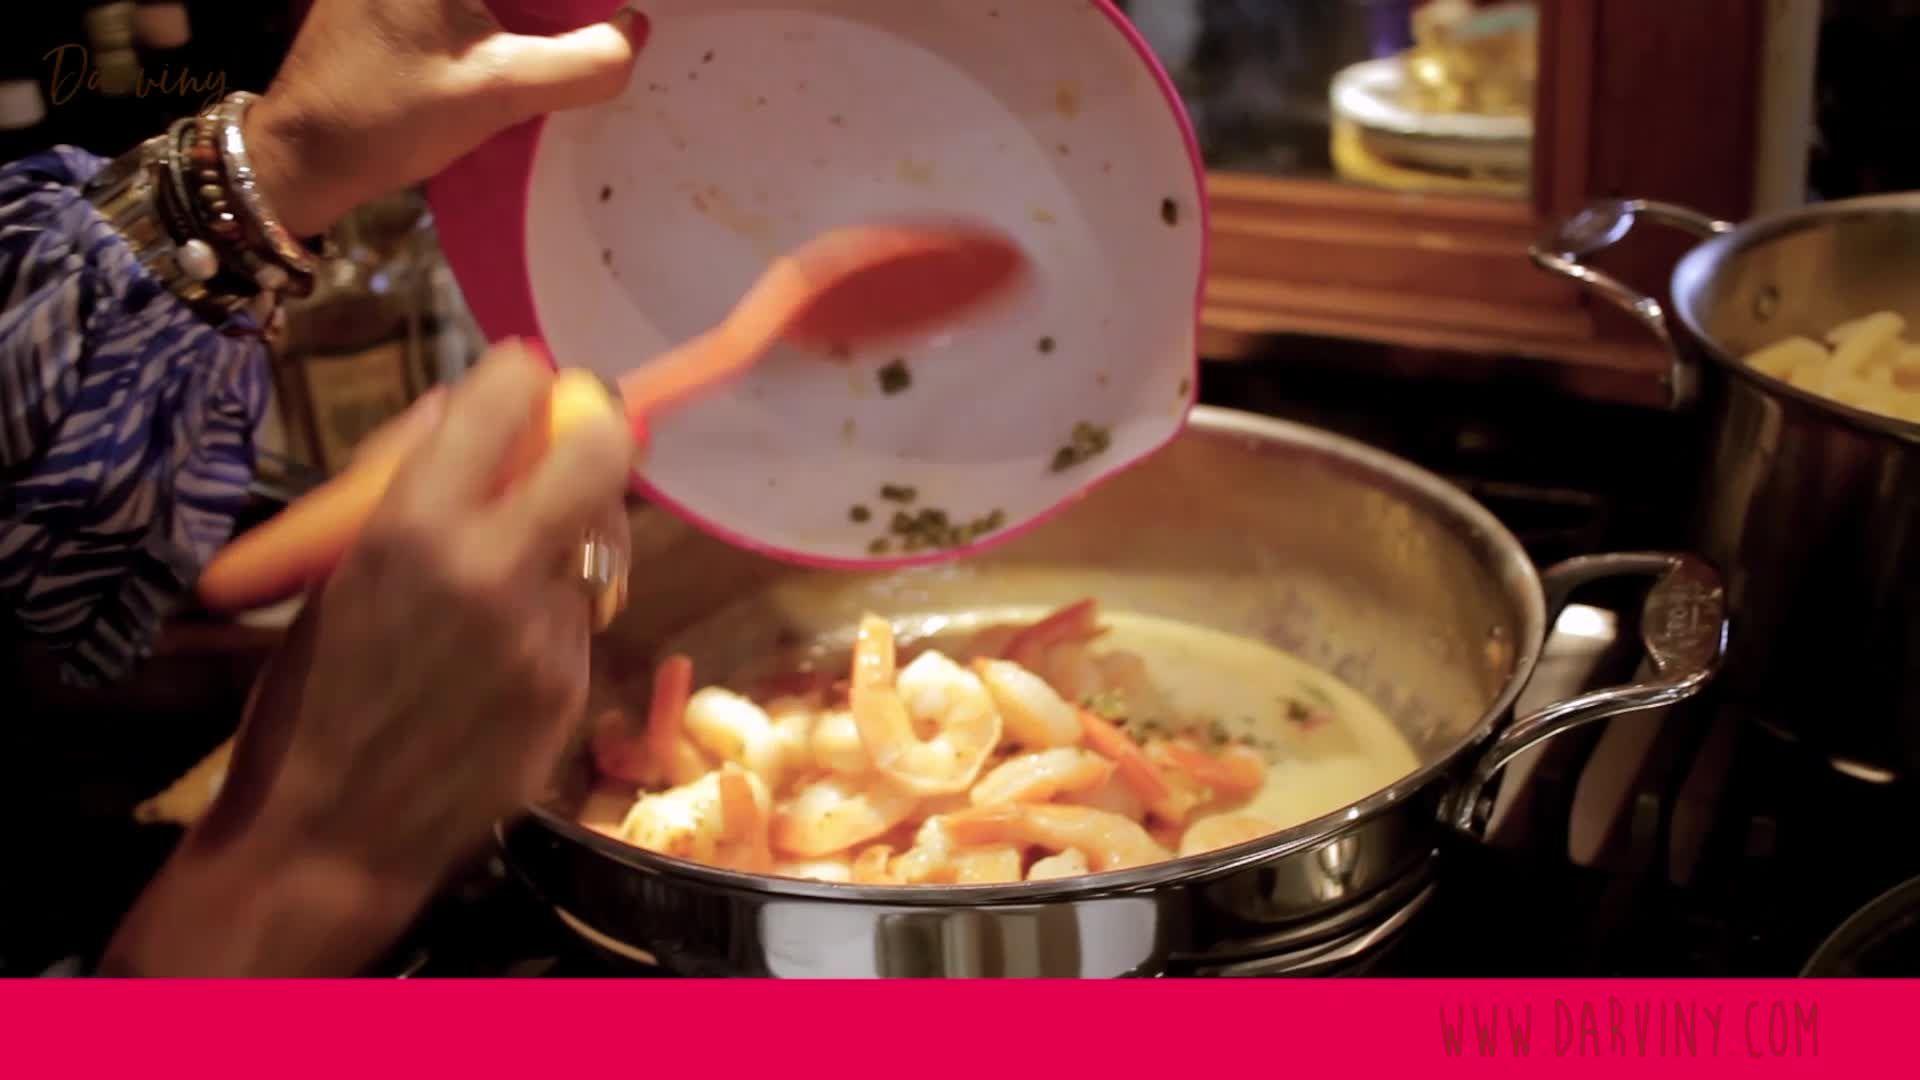 The Love, Darviny Show - How to Make Sauteed Shrimp & Pasta- trailer